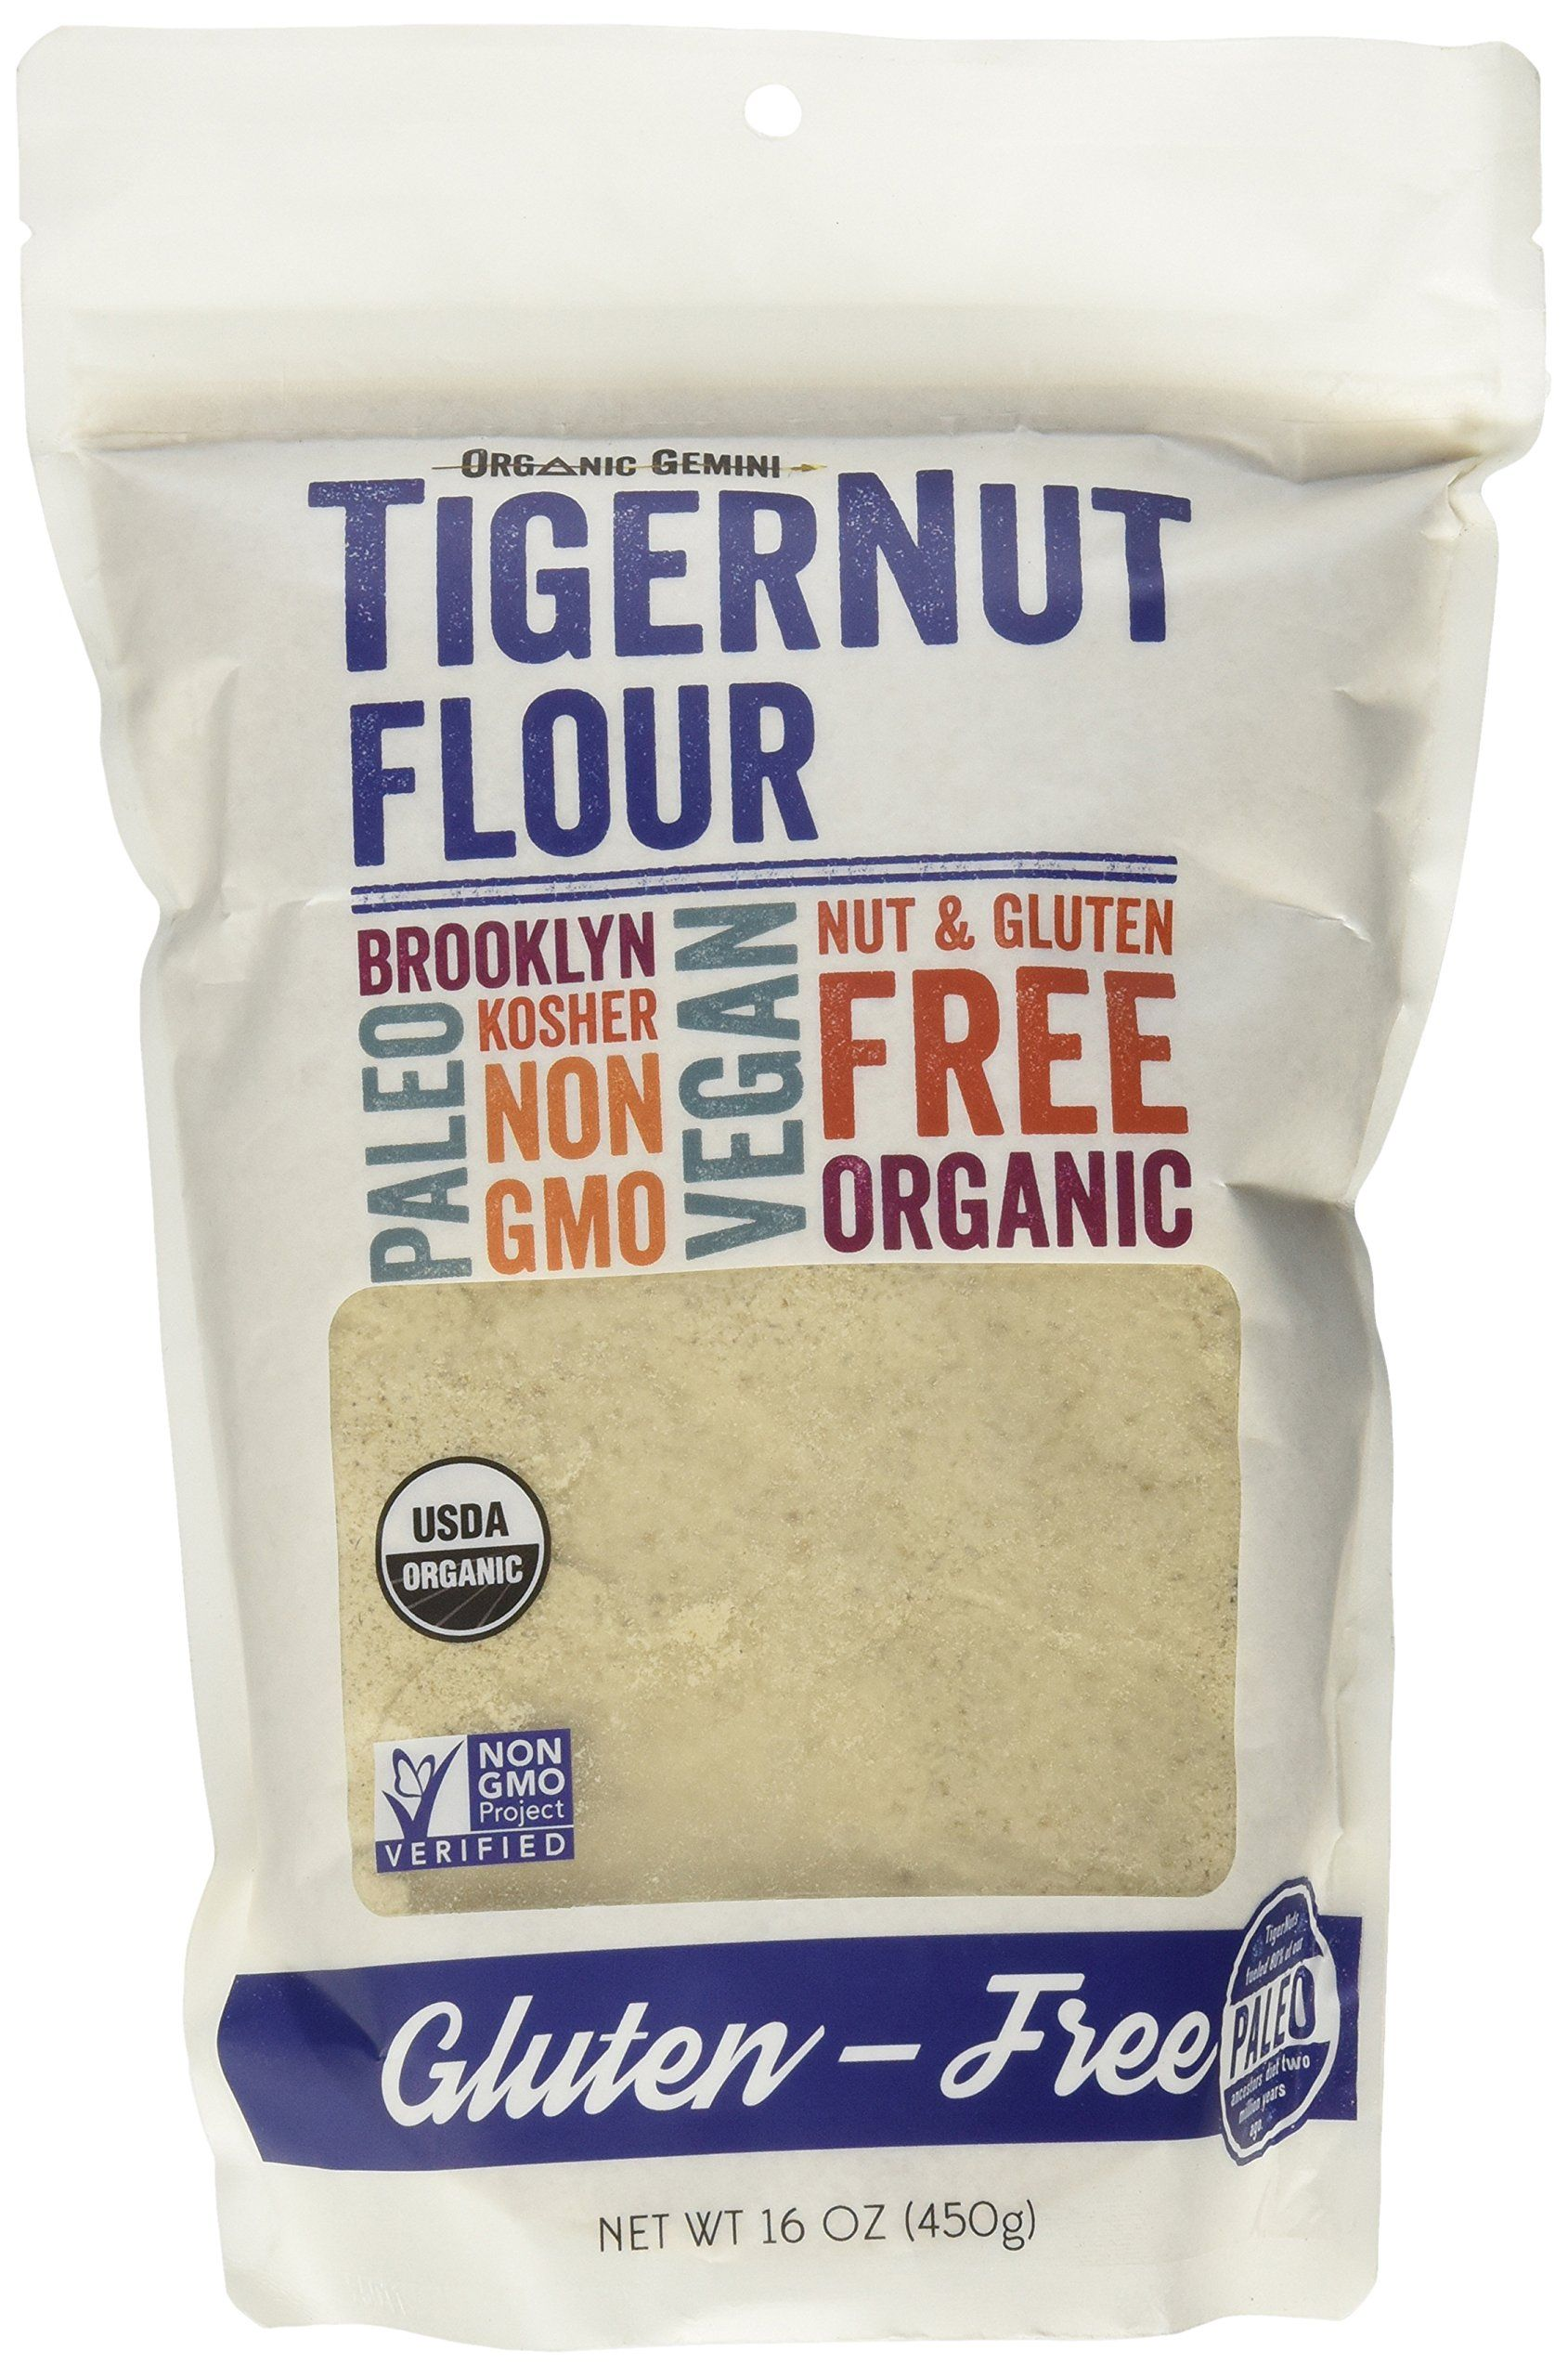 TigerNut Flour (1 Pound) | Gluten-Free | Tigernut flour